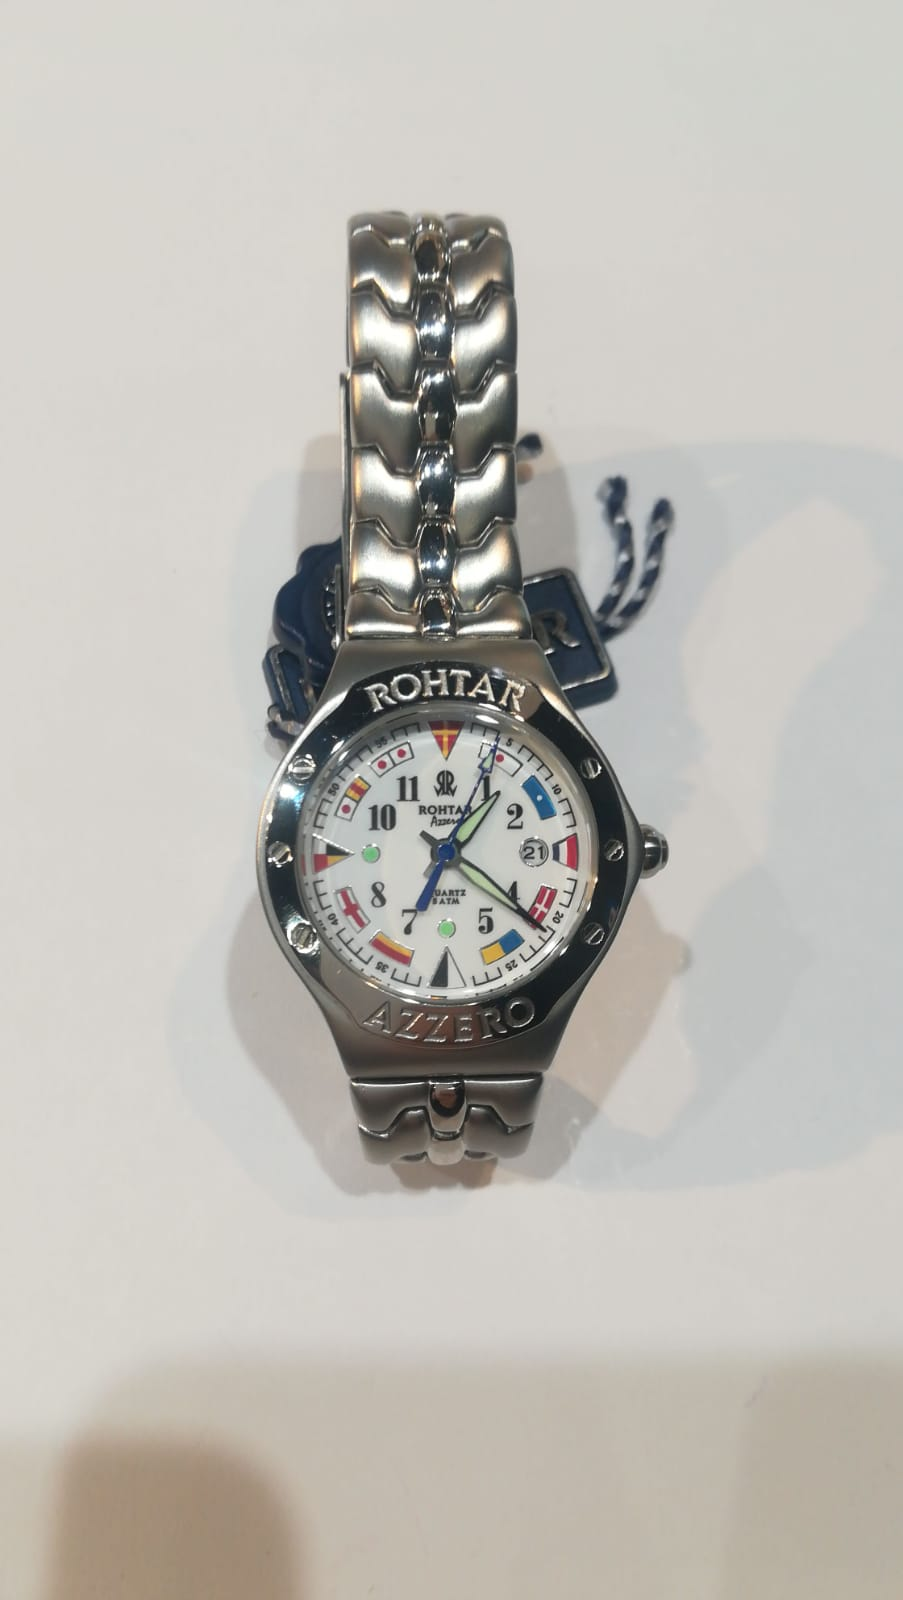 Reloj Rohtar